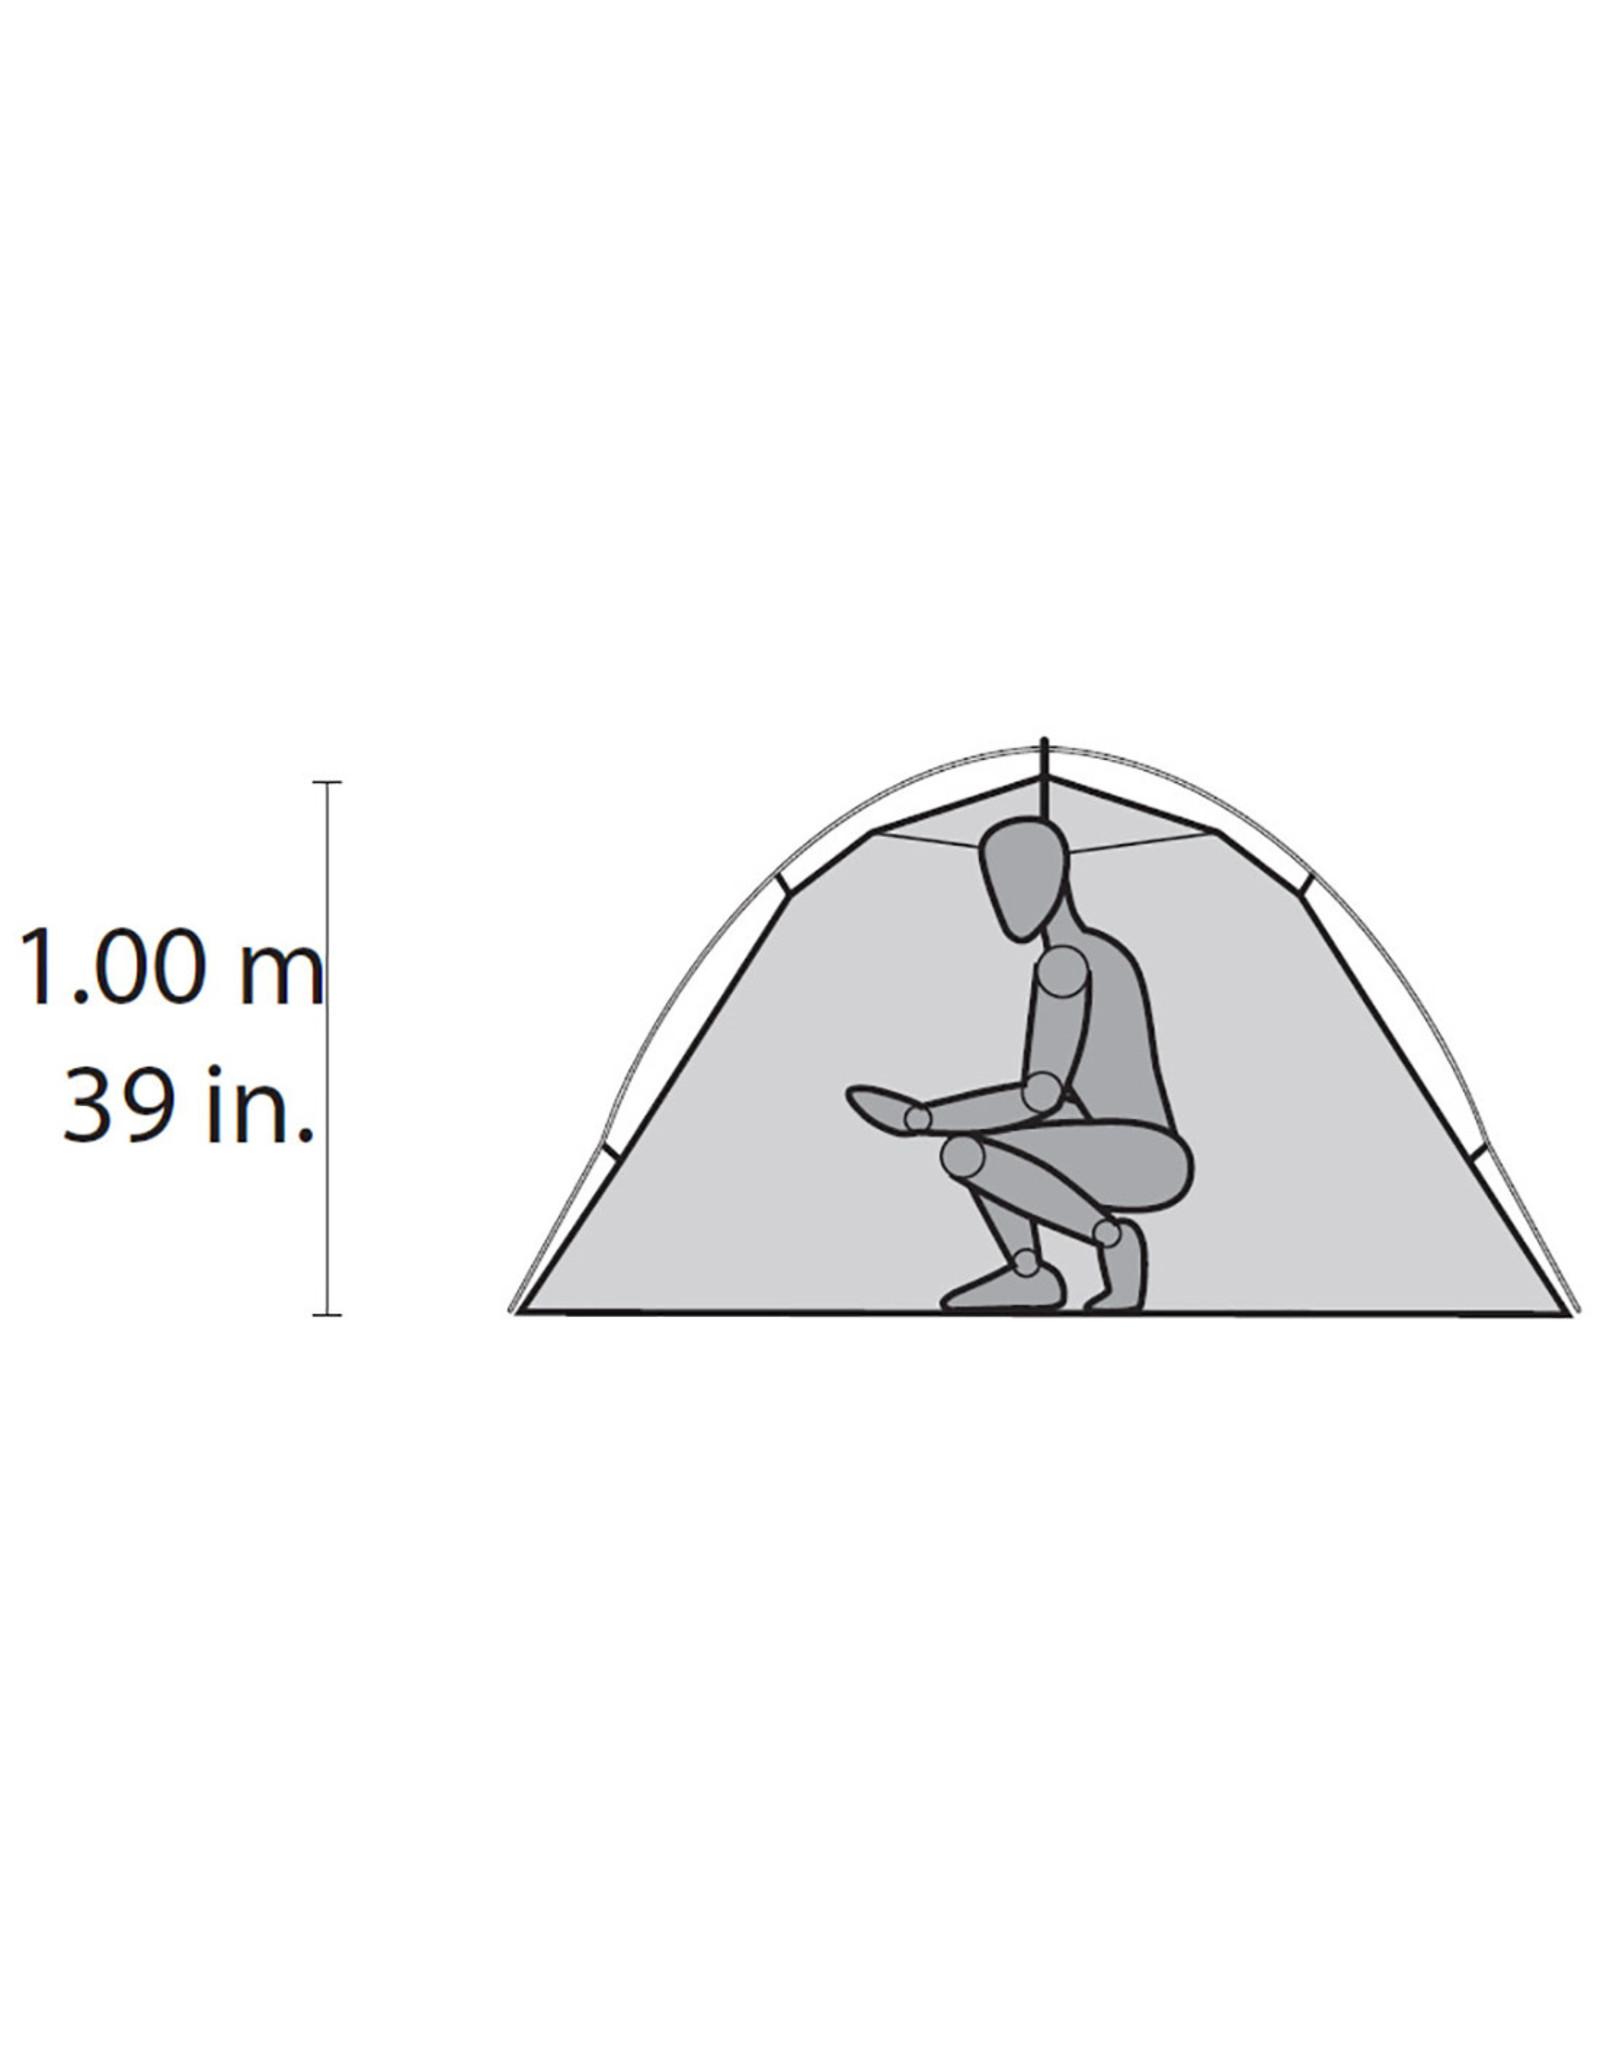 MSR MSR Hubba Hubba NX V8 2-Person Tent